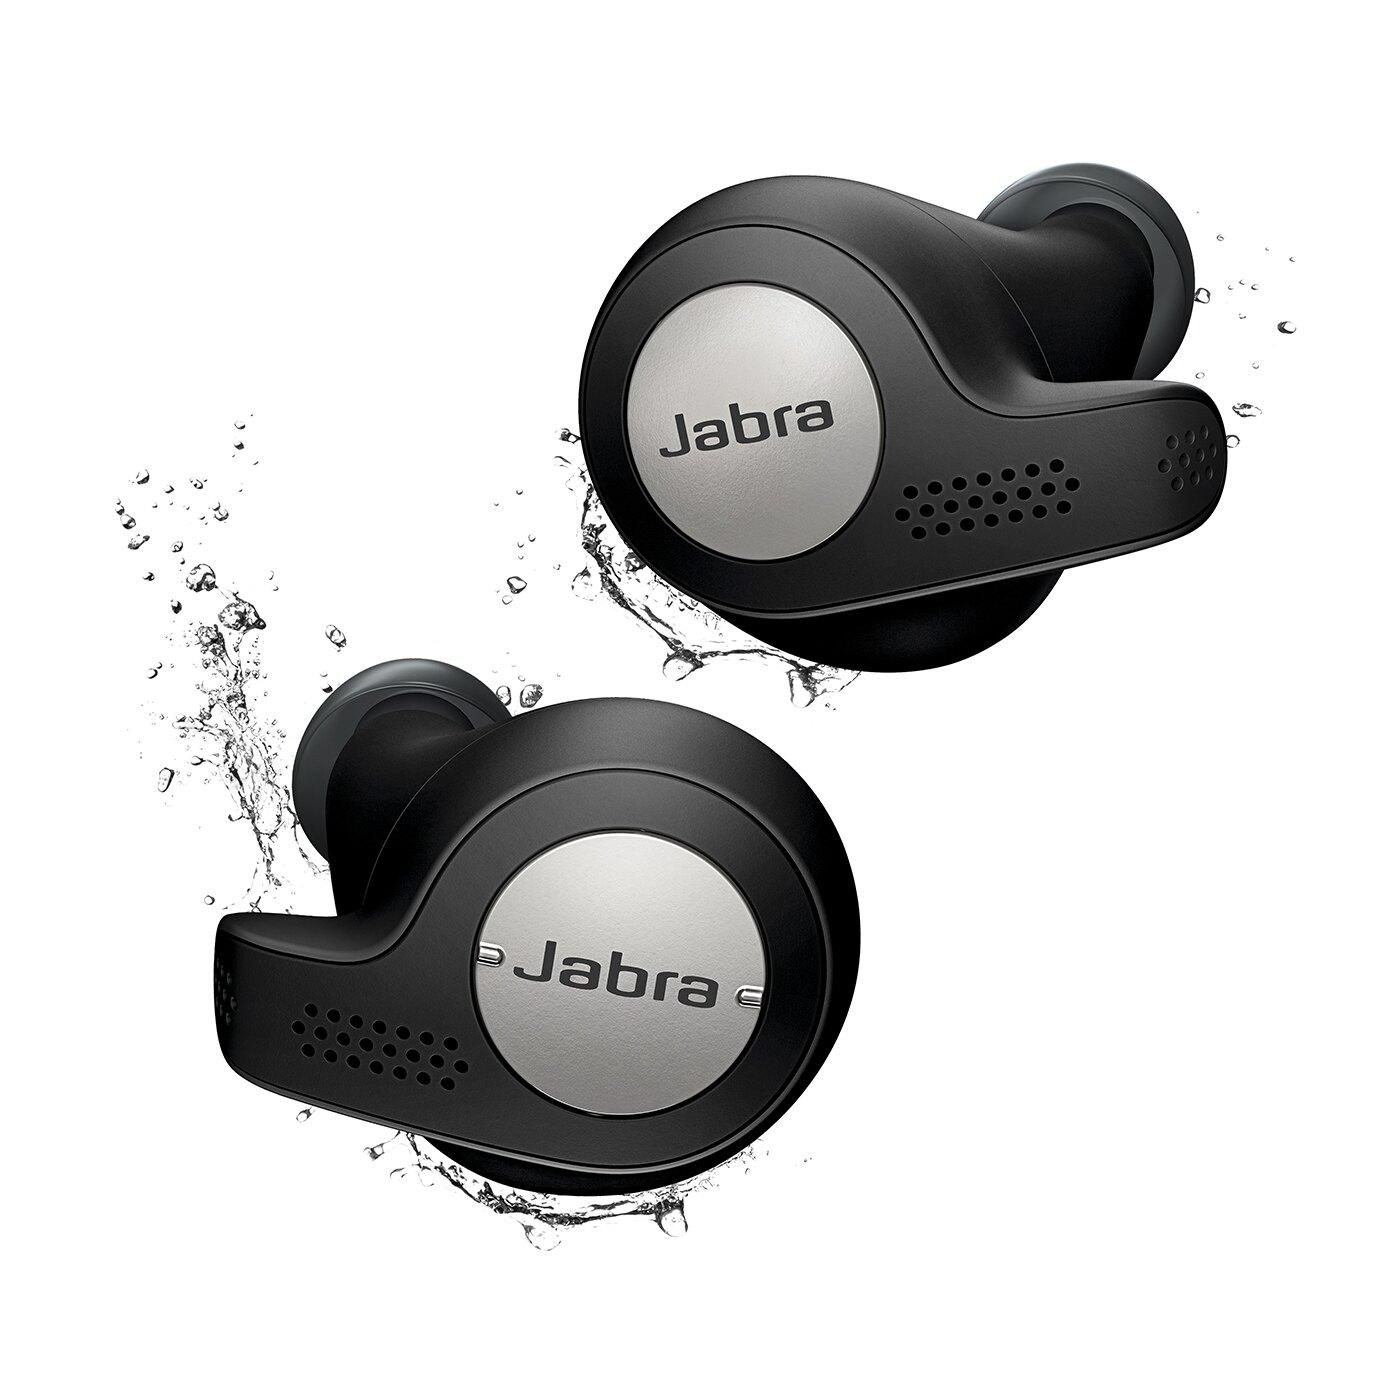 Jabra Elite Active 65t True Wireless Sport Earbuds (Refurb) + $7 Rakuten Points